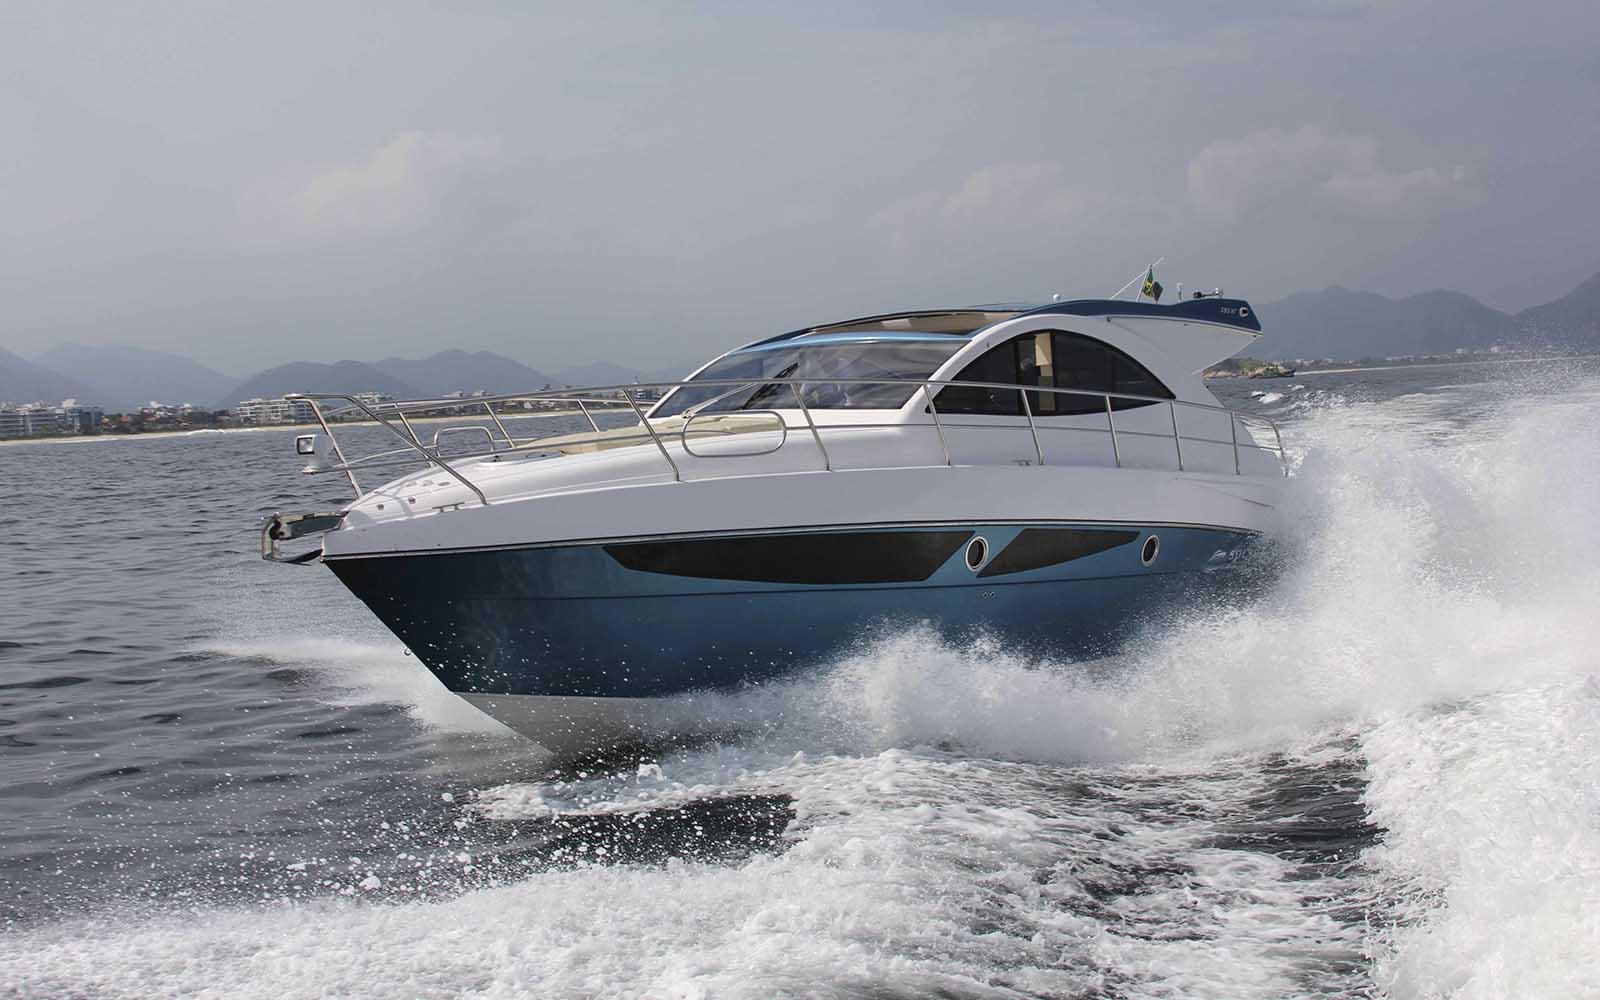 boat teste solara 380 HT - boat shopping